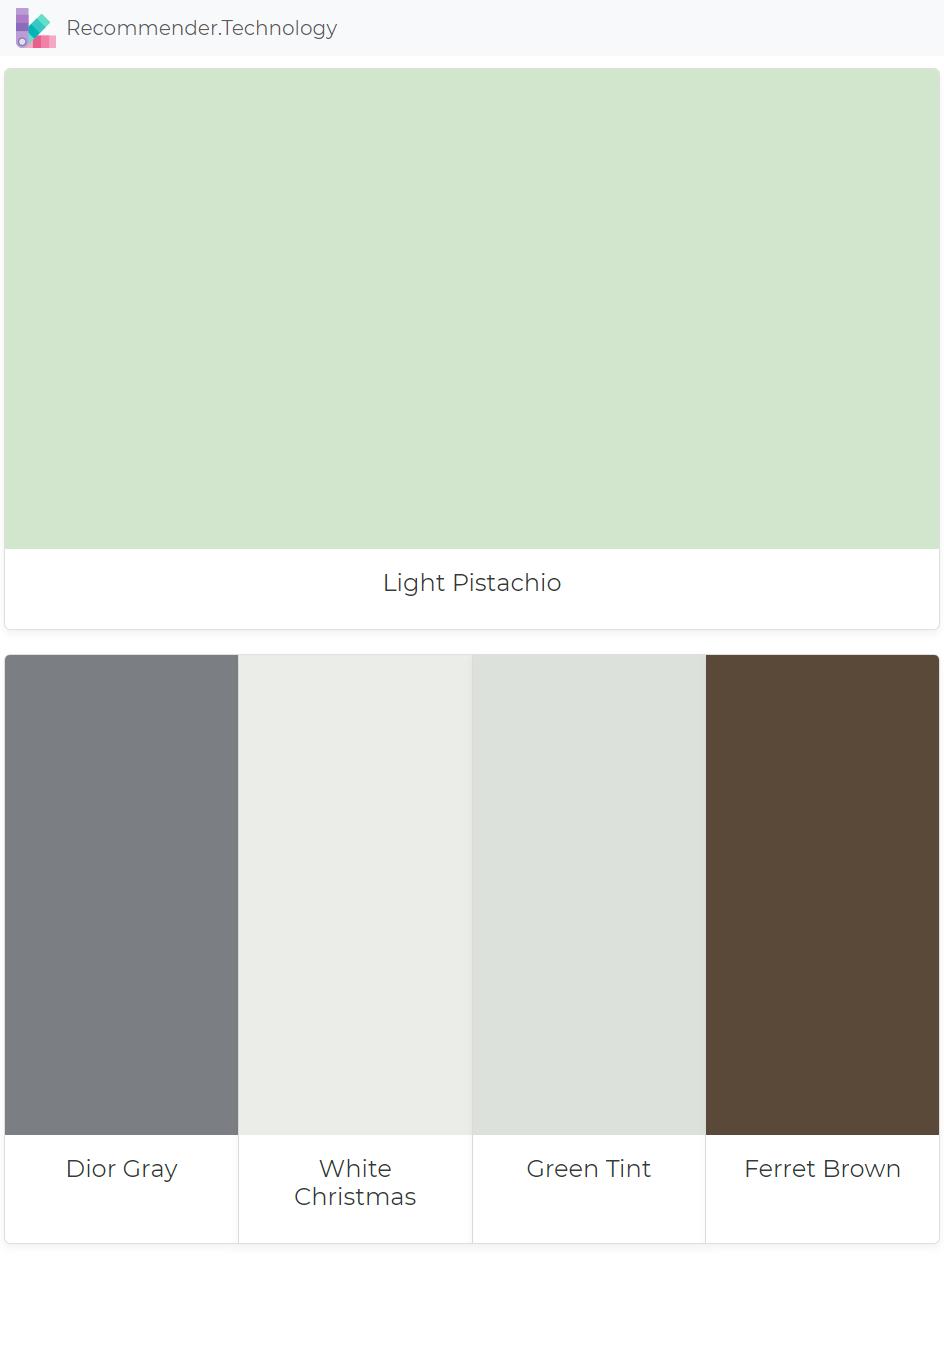 Christmas Green Color.Light Pistachio Dior Gray White Christmas Green Tint